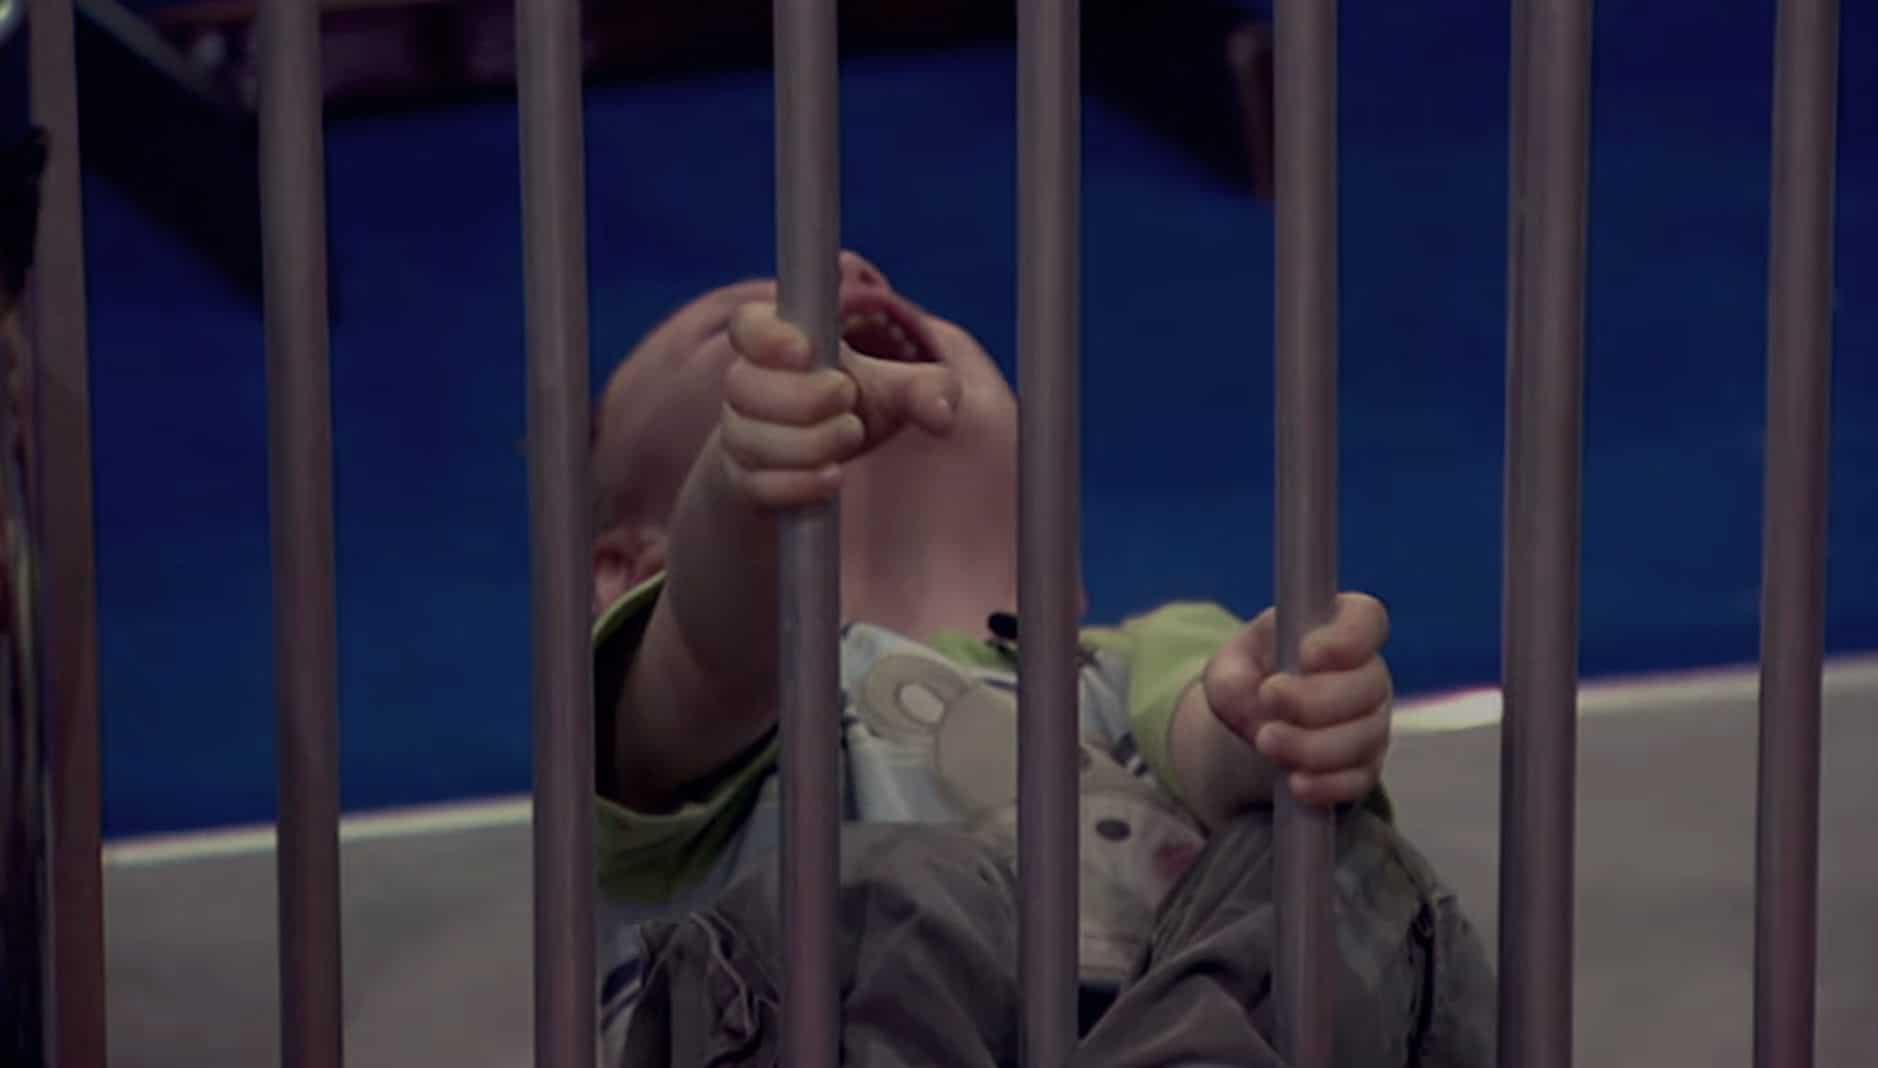 child-with-behavior-problems